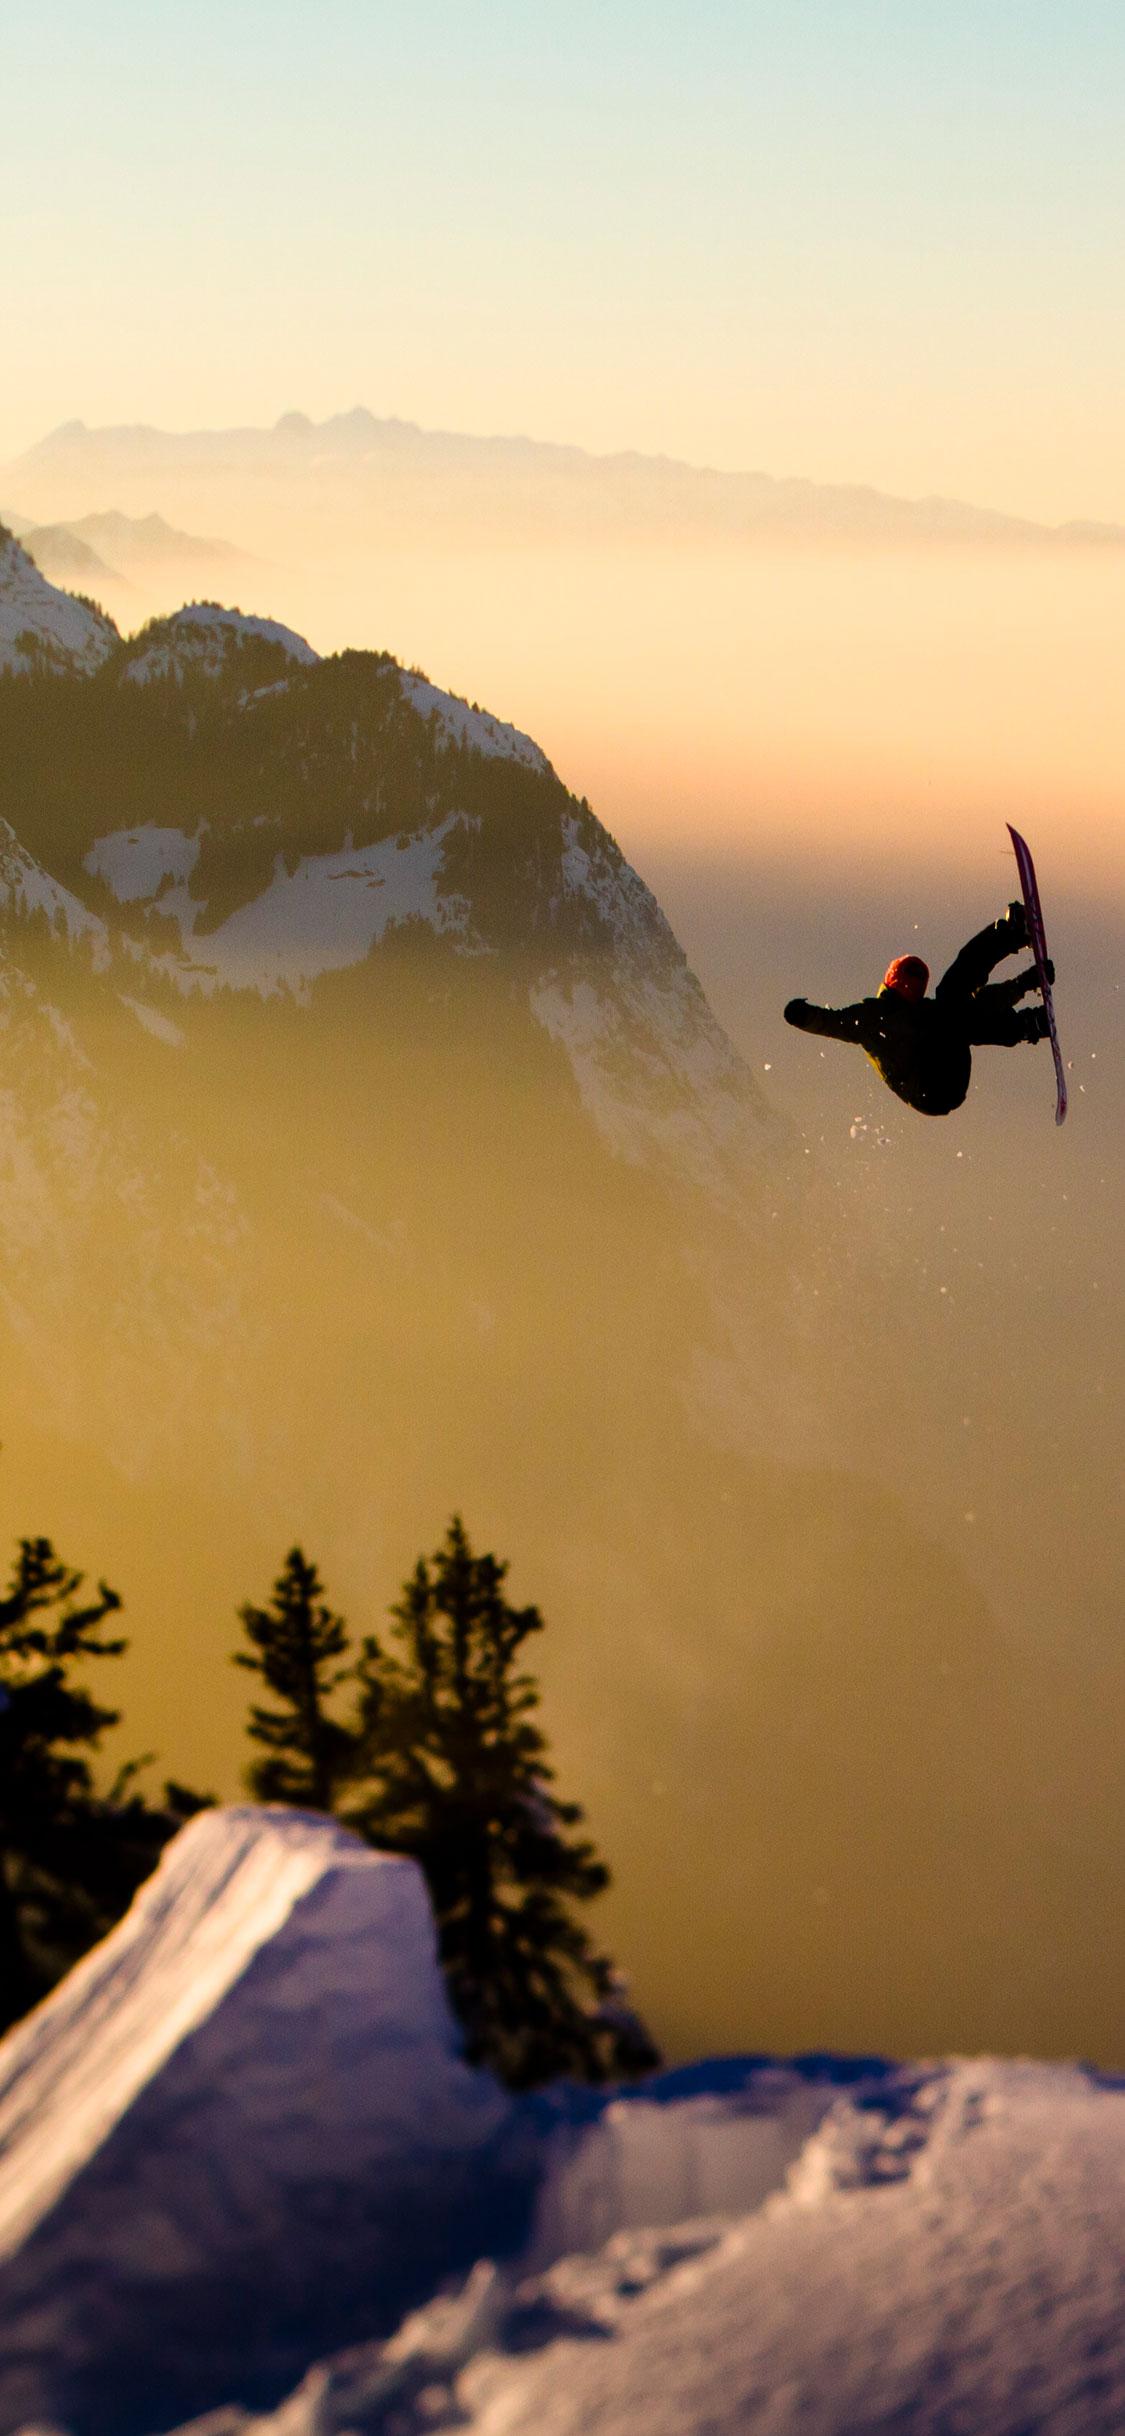 iPhone wallpaper snowboard1 Snowboard